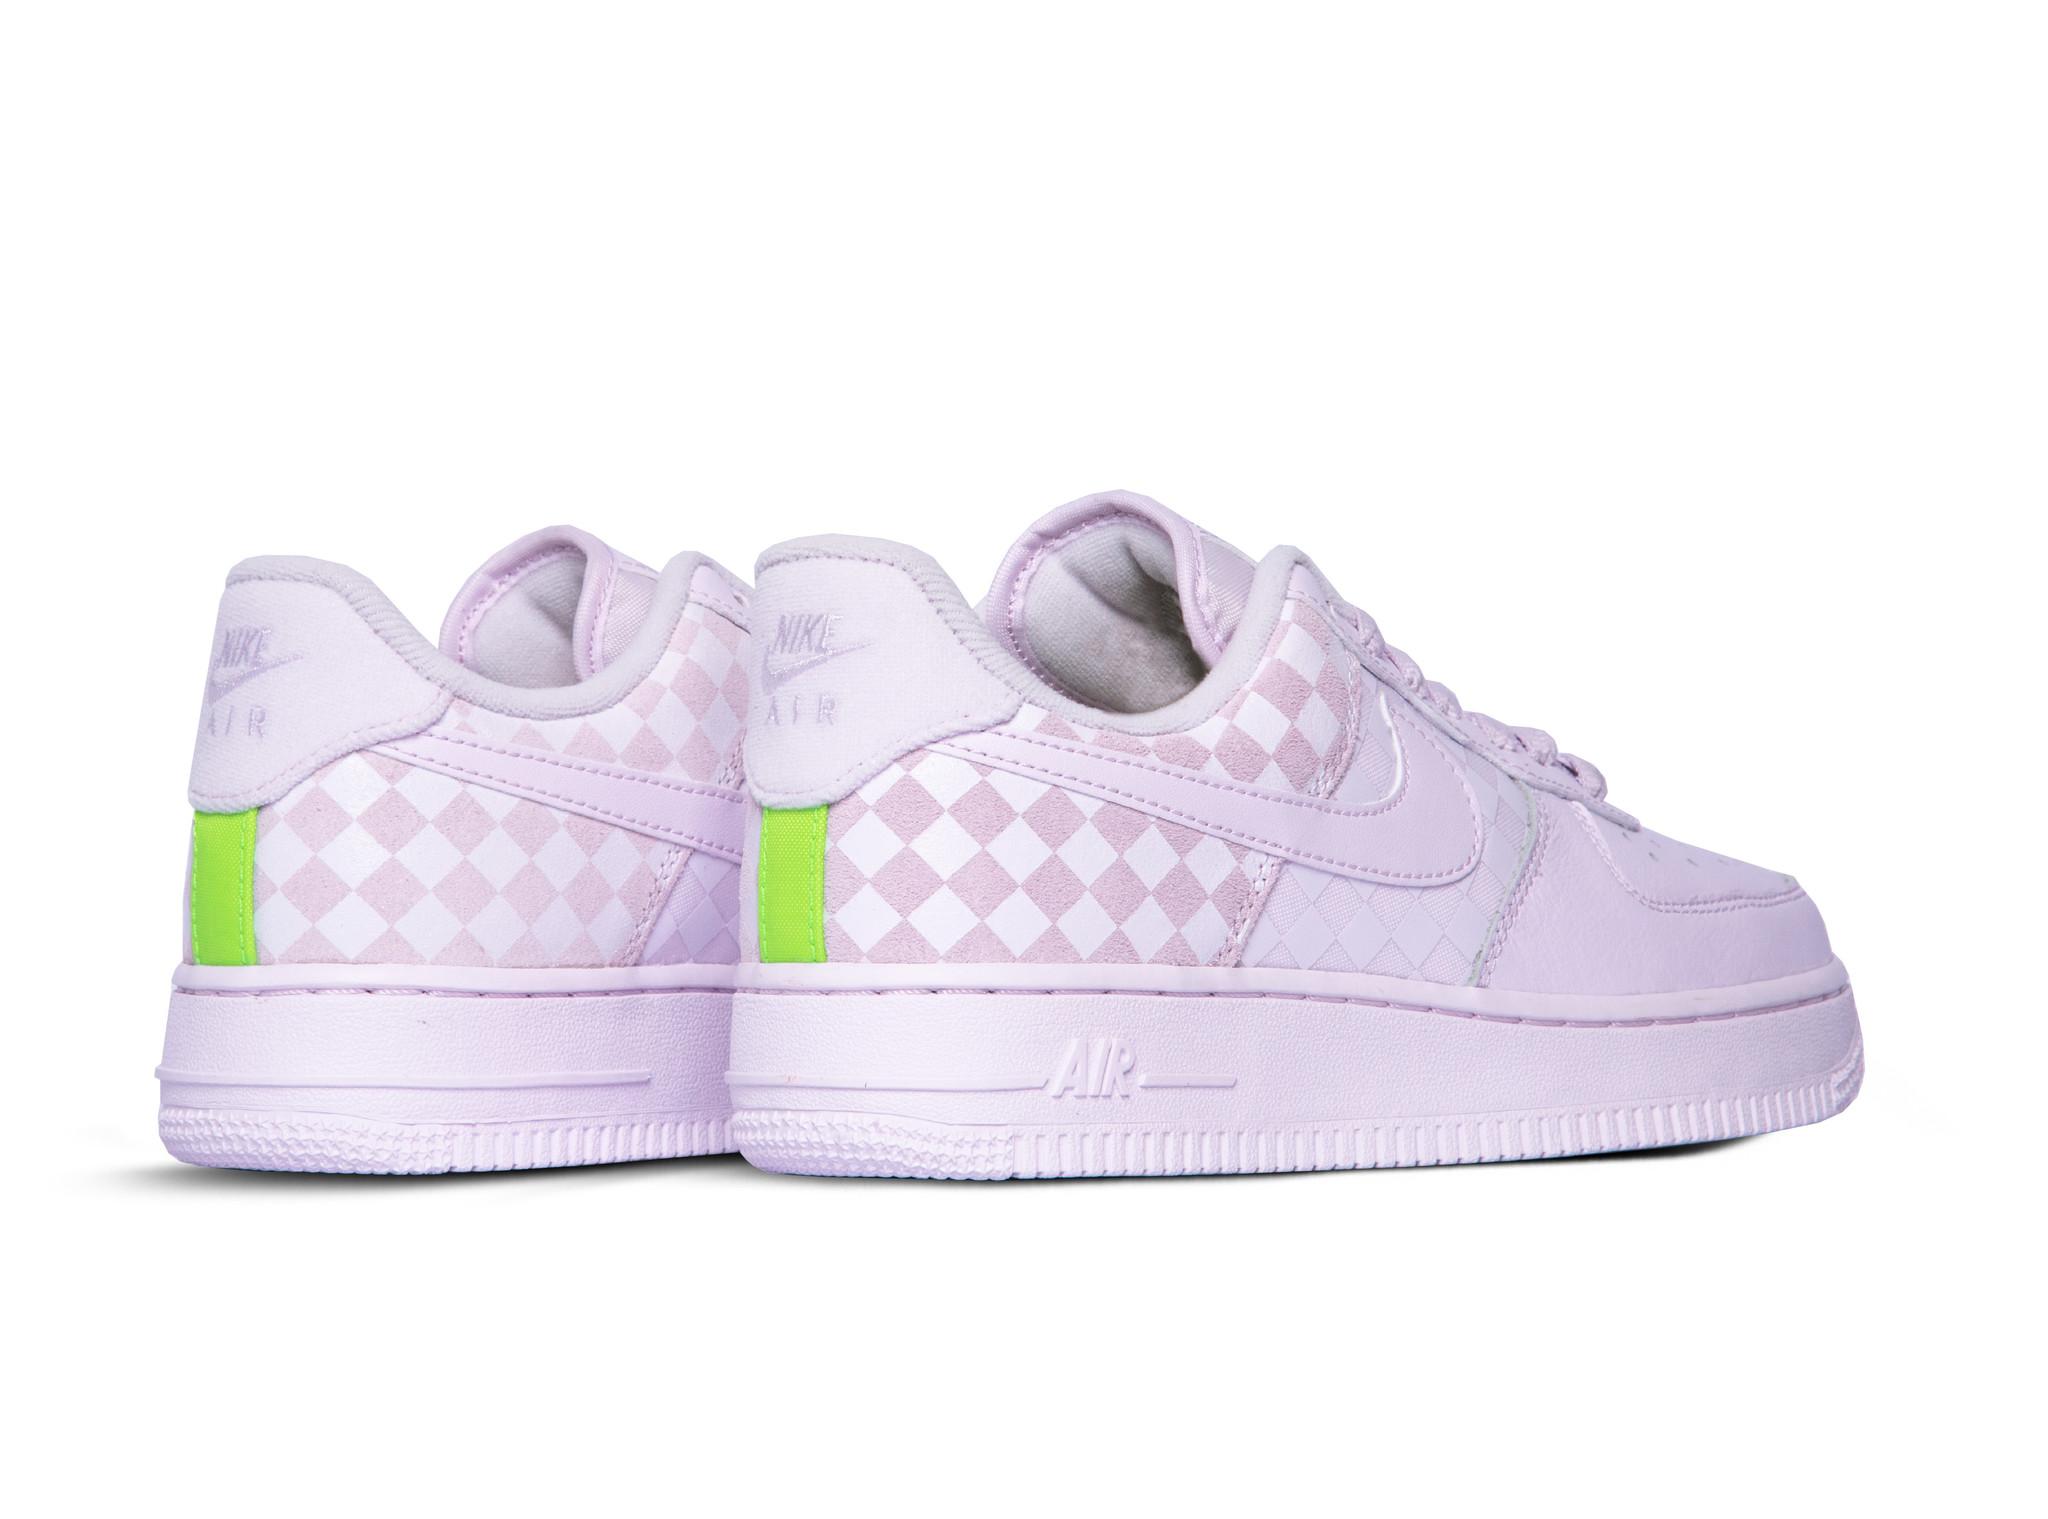 W Air Force 1 Lo Barely Grape CJ9700 500 Bruut Sneakers